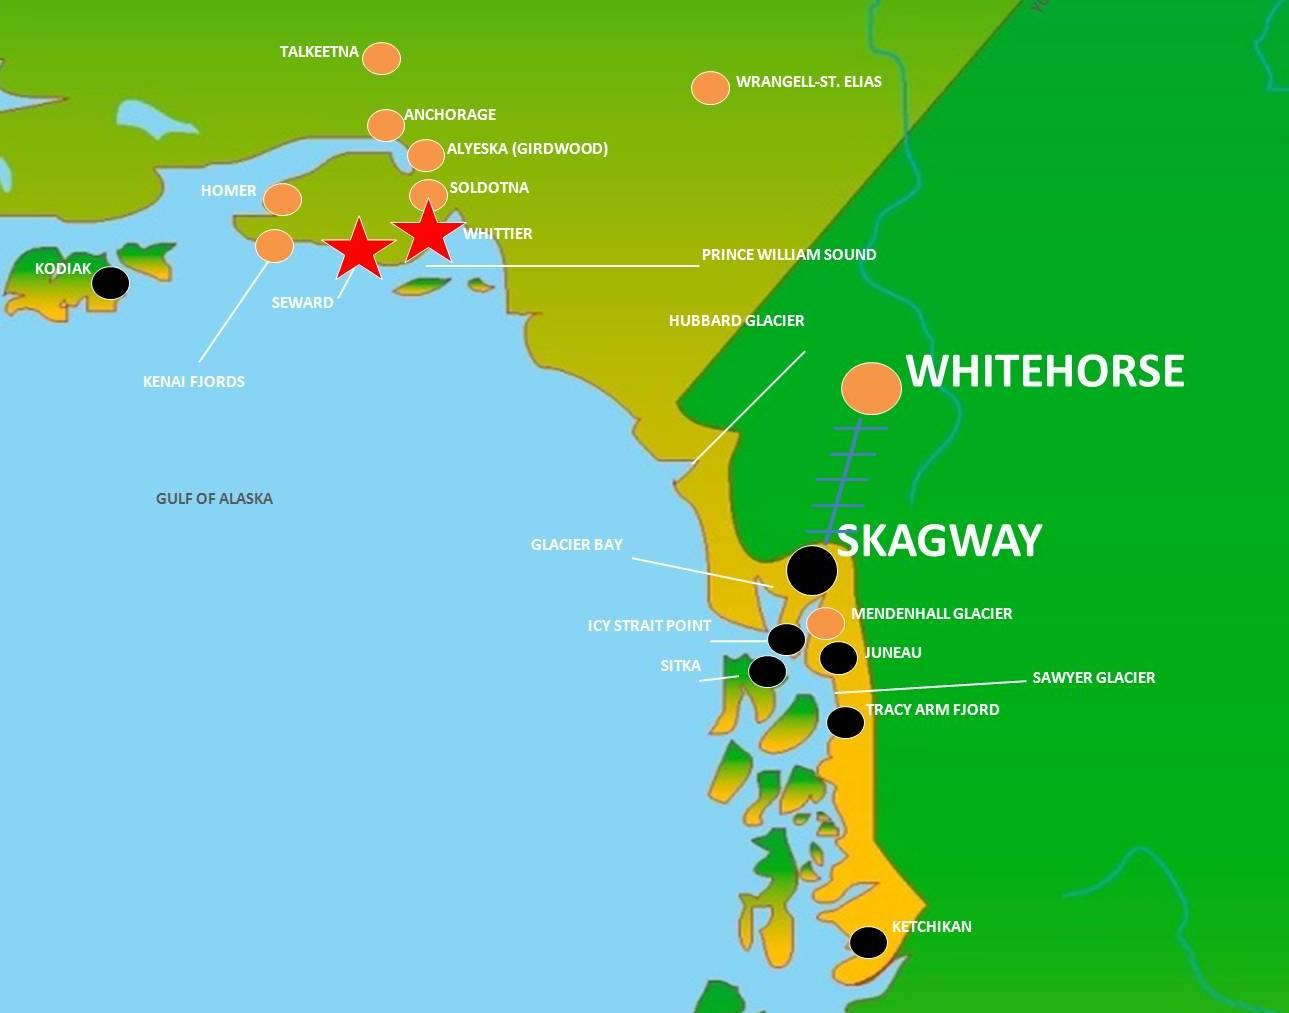 skagway to whitehorse map - CruiseExperts.com Blog